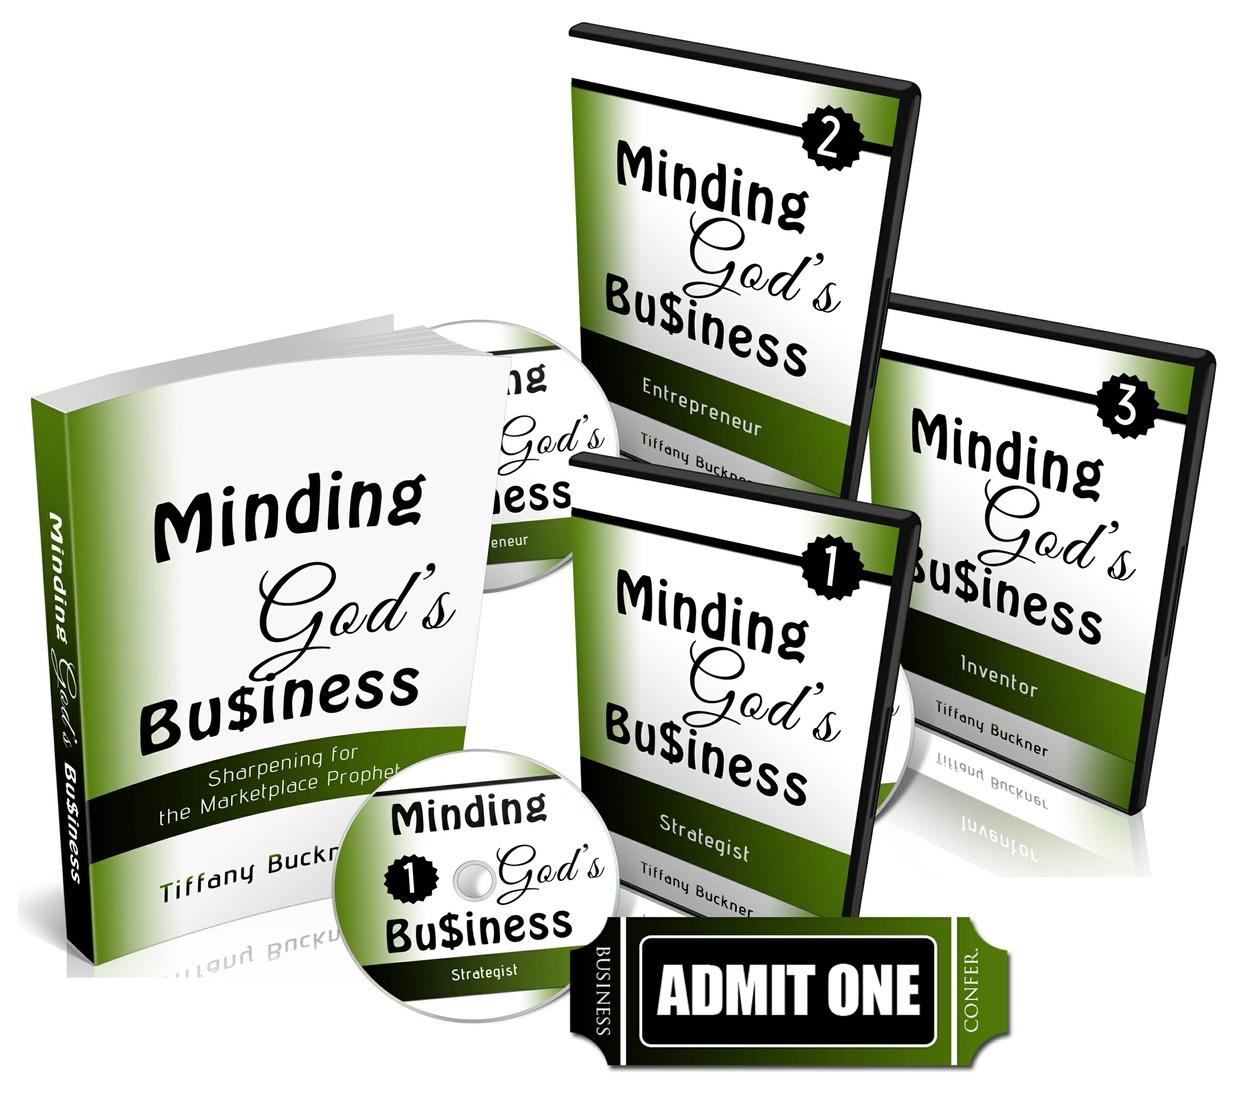 Minding God's Business Wealth Building Seminar